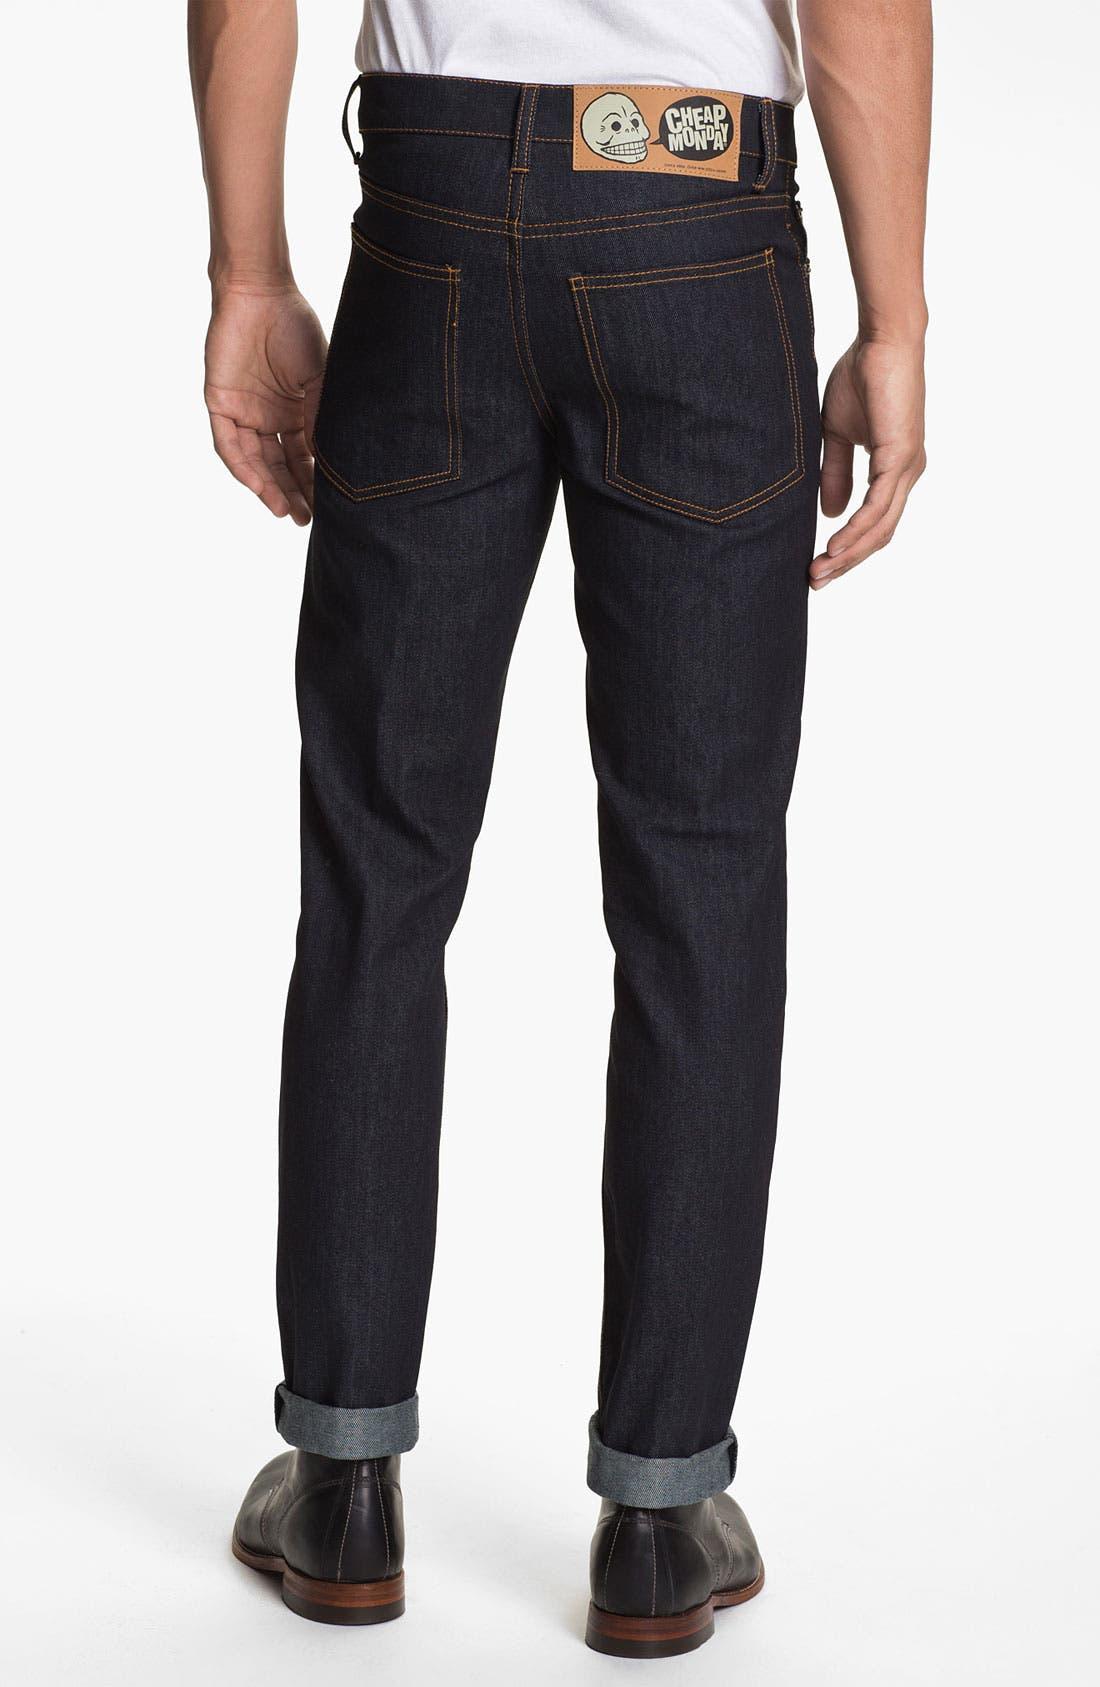 Alternate Image 1 Selected - Cheap Monday Slim Straight Leg Jeans (Original Unwashed)